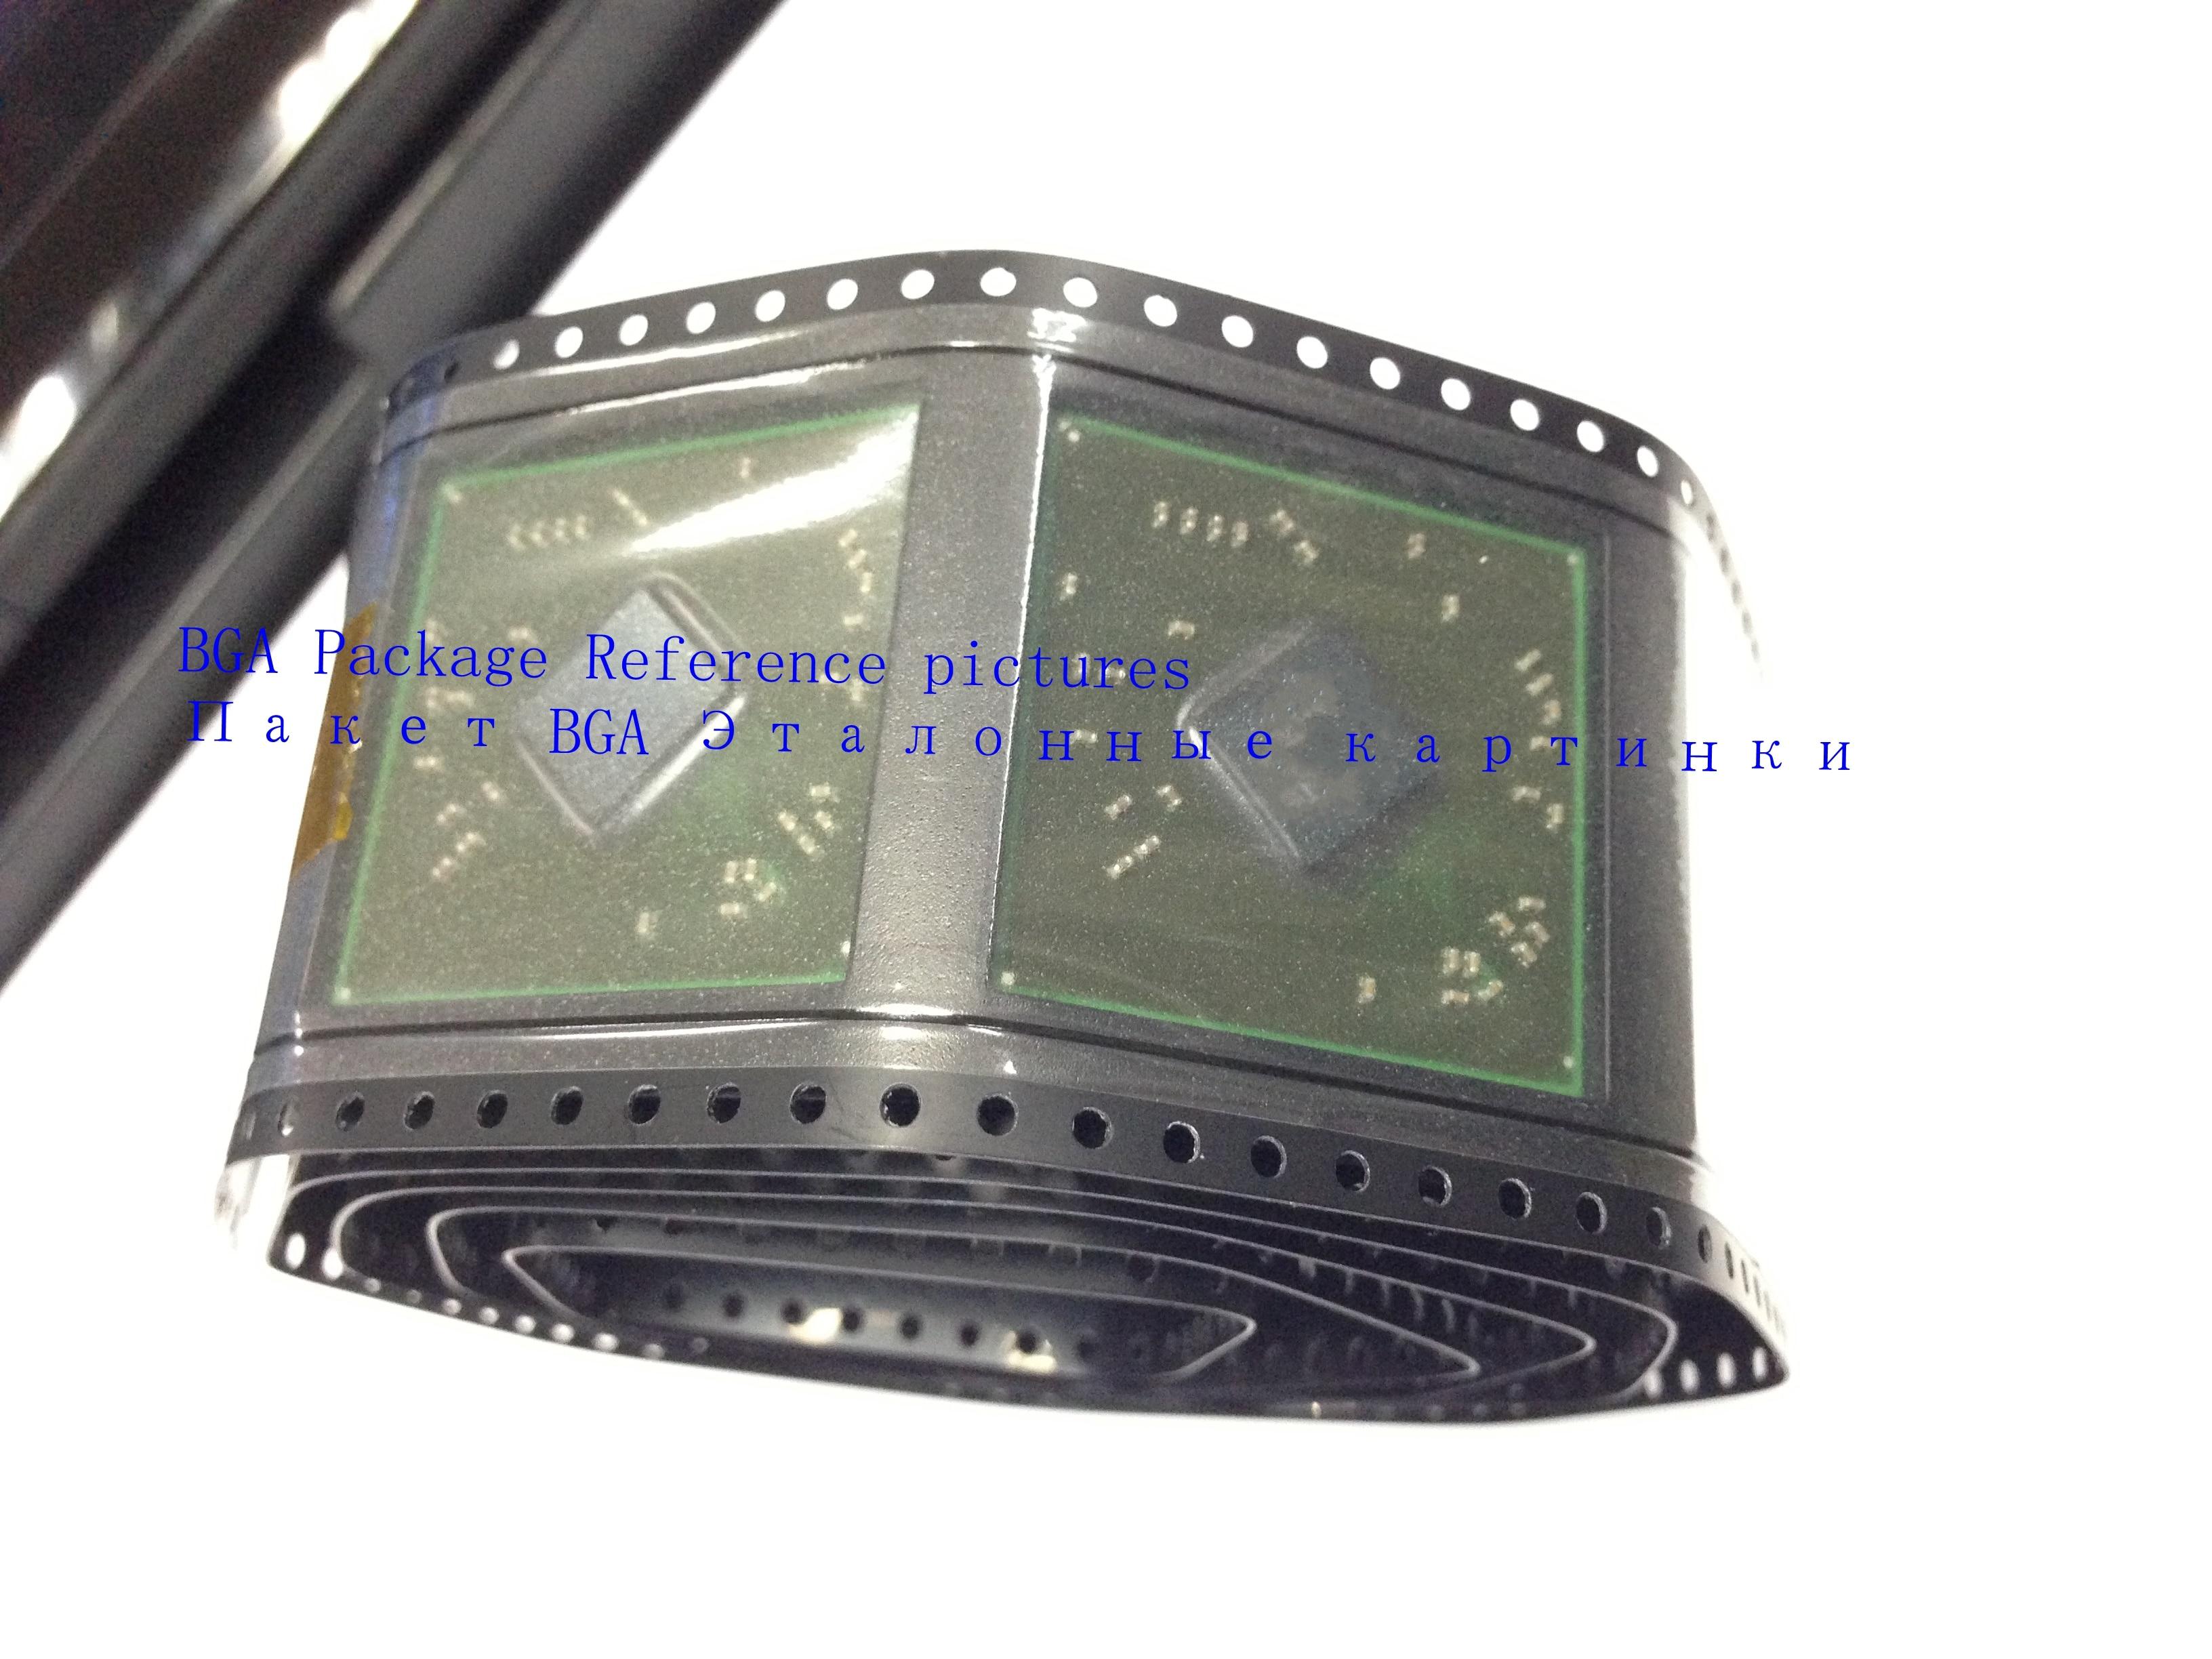 1 pz/lotto 100% Nuovo N13P-GT-W-A2 N13P GT W A2 BGA Chipset1 pz/lotto 100% Nuovo N13P-GT-W-A2 N13P GT W A2 BGA Chipset